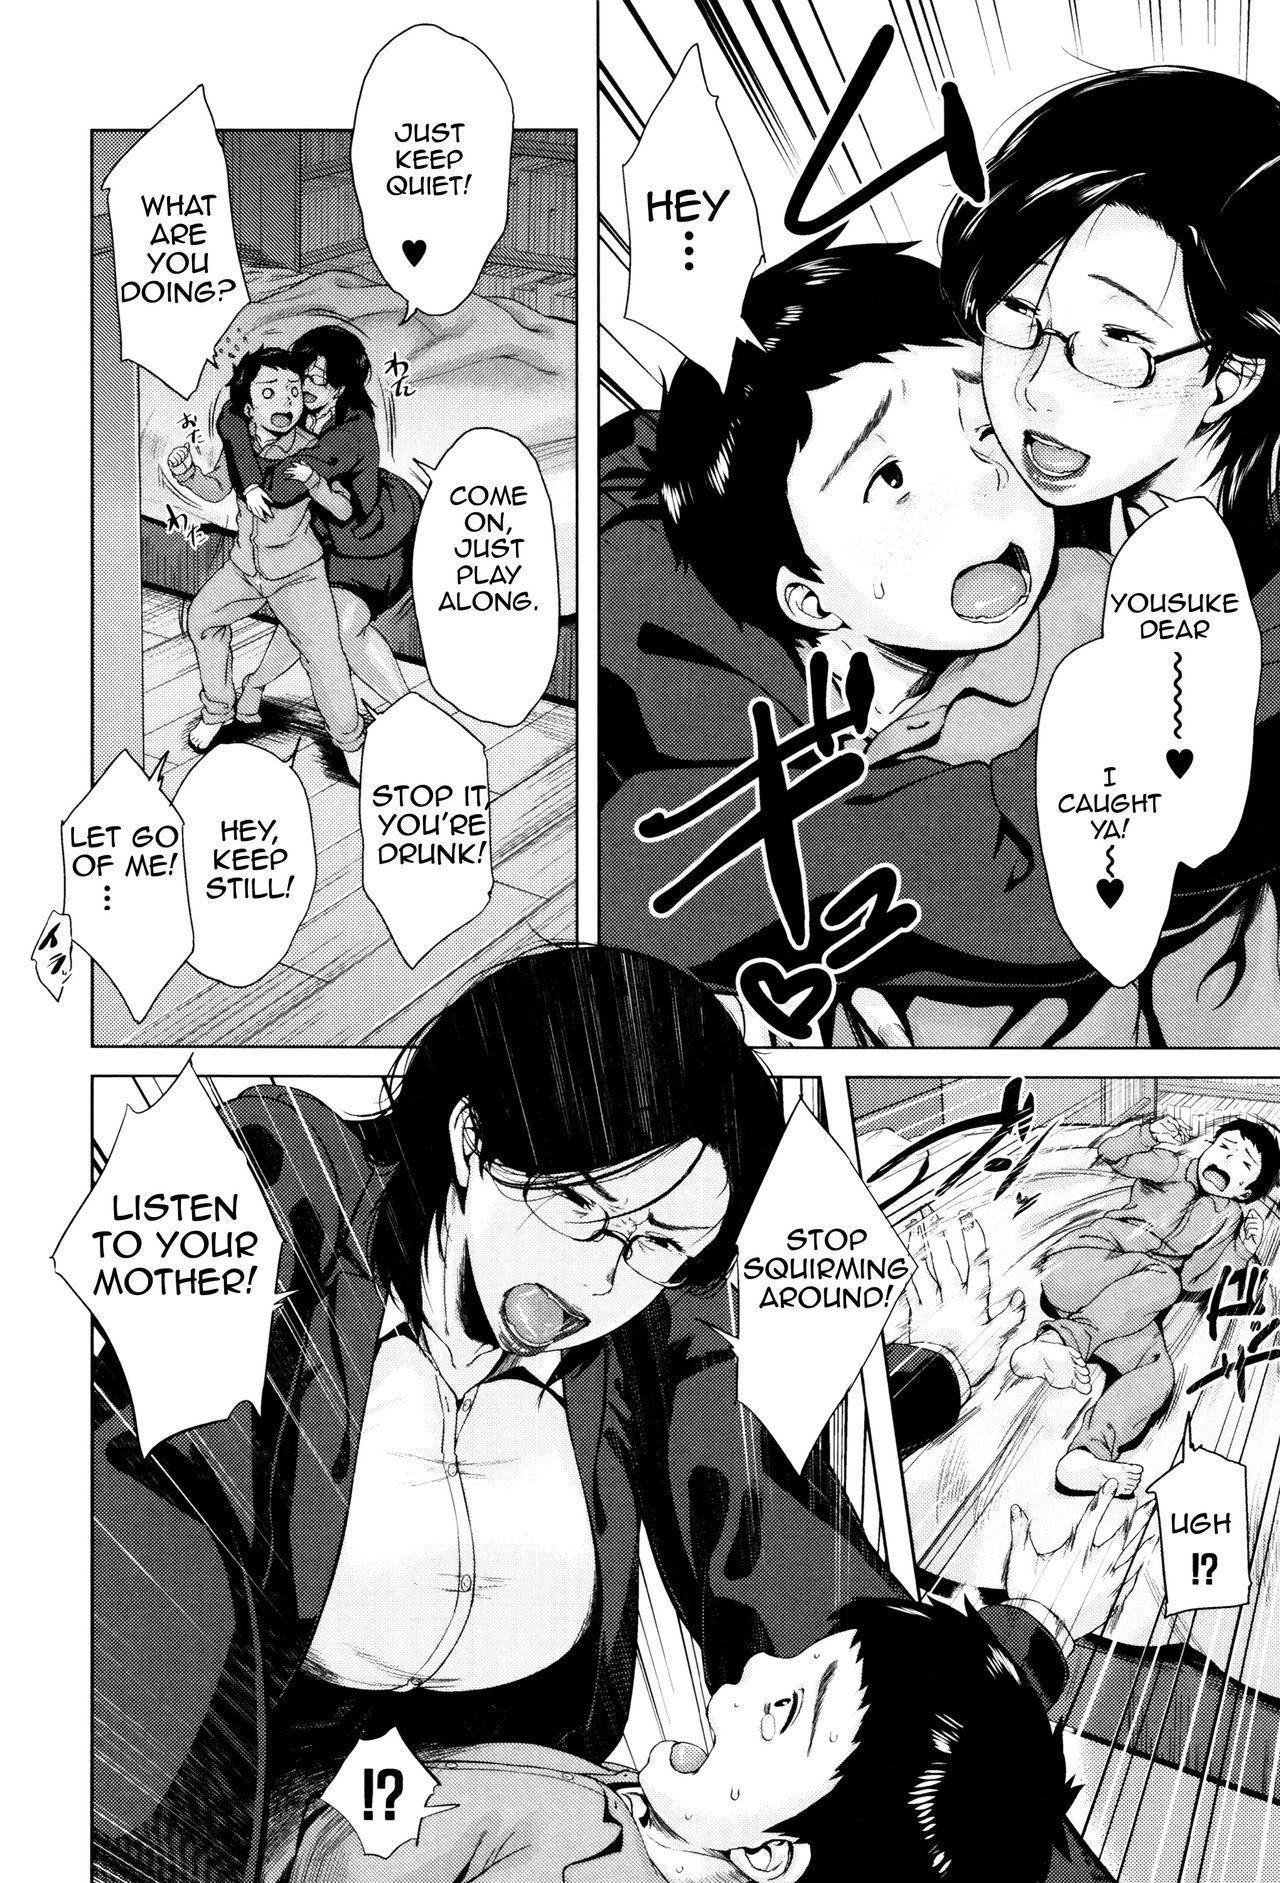 [Jitsuma] Kinyoubi no Haha-tachi e - To Friday's mothers [English] [Amoskandy, desudesu, Kusanyagi] 102